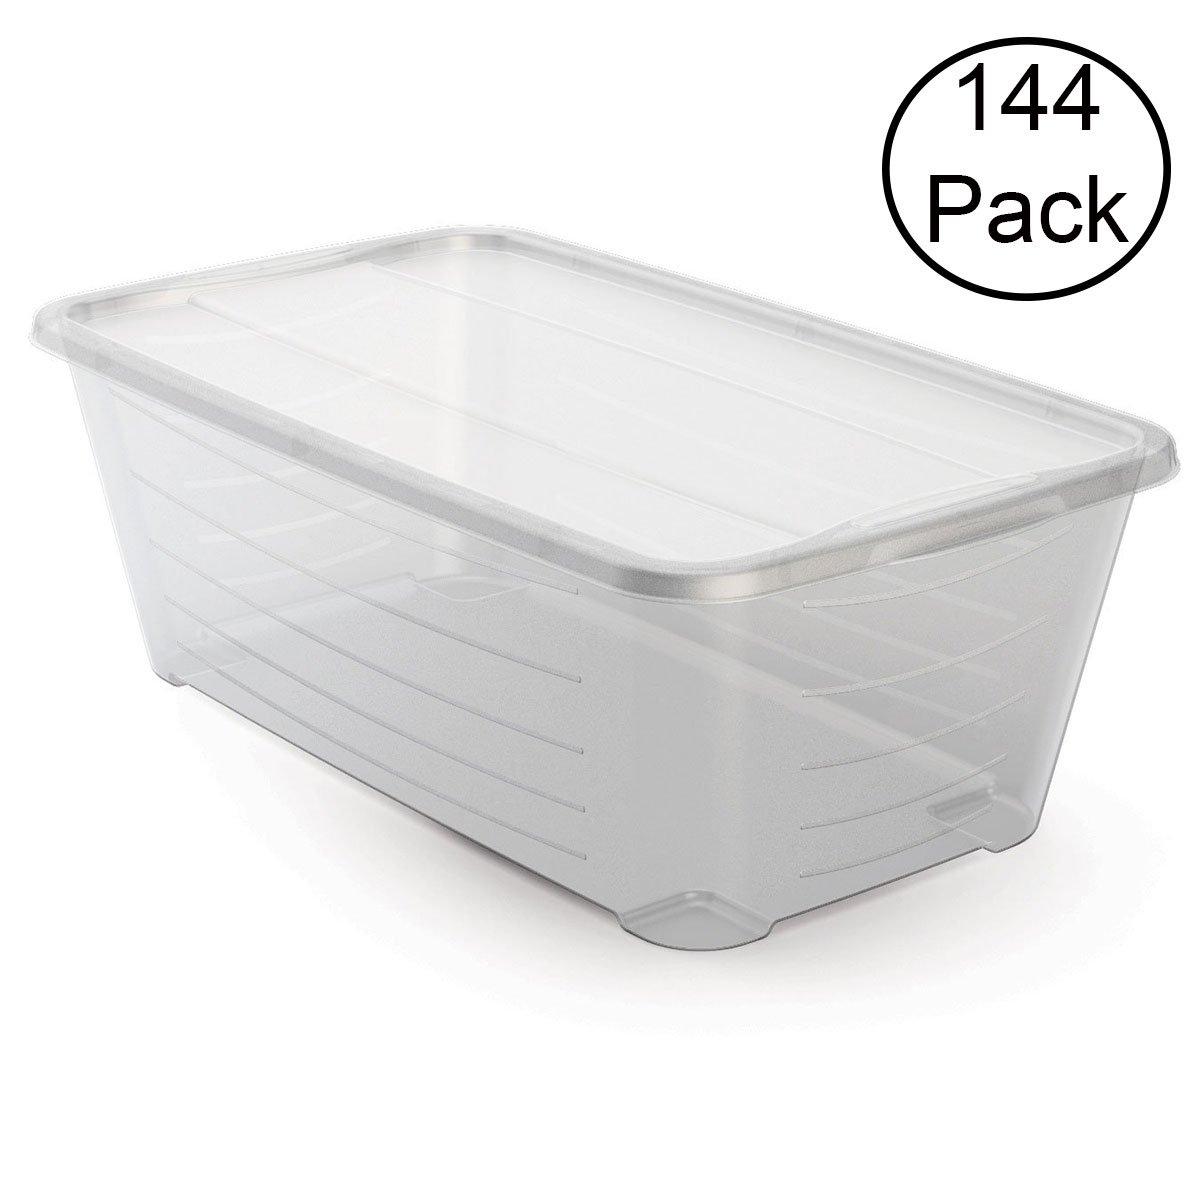 Life Story 5.5 Quart Rectangular Clear Protective Storage Shoe Box (144 Pack)